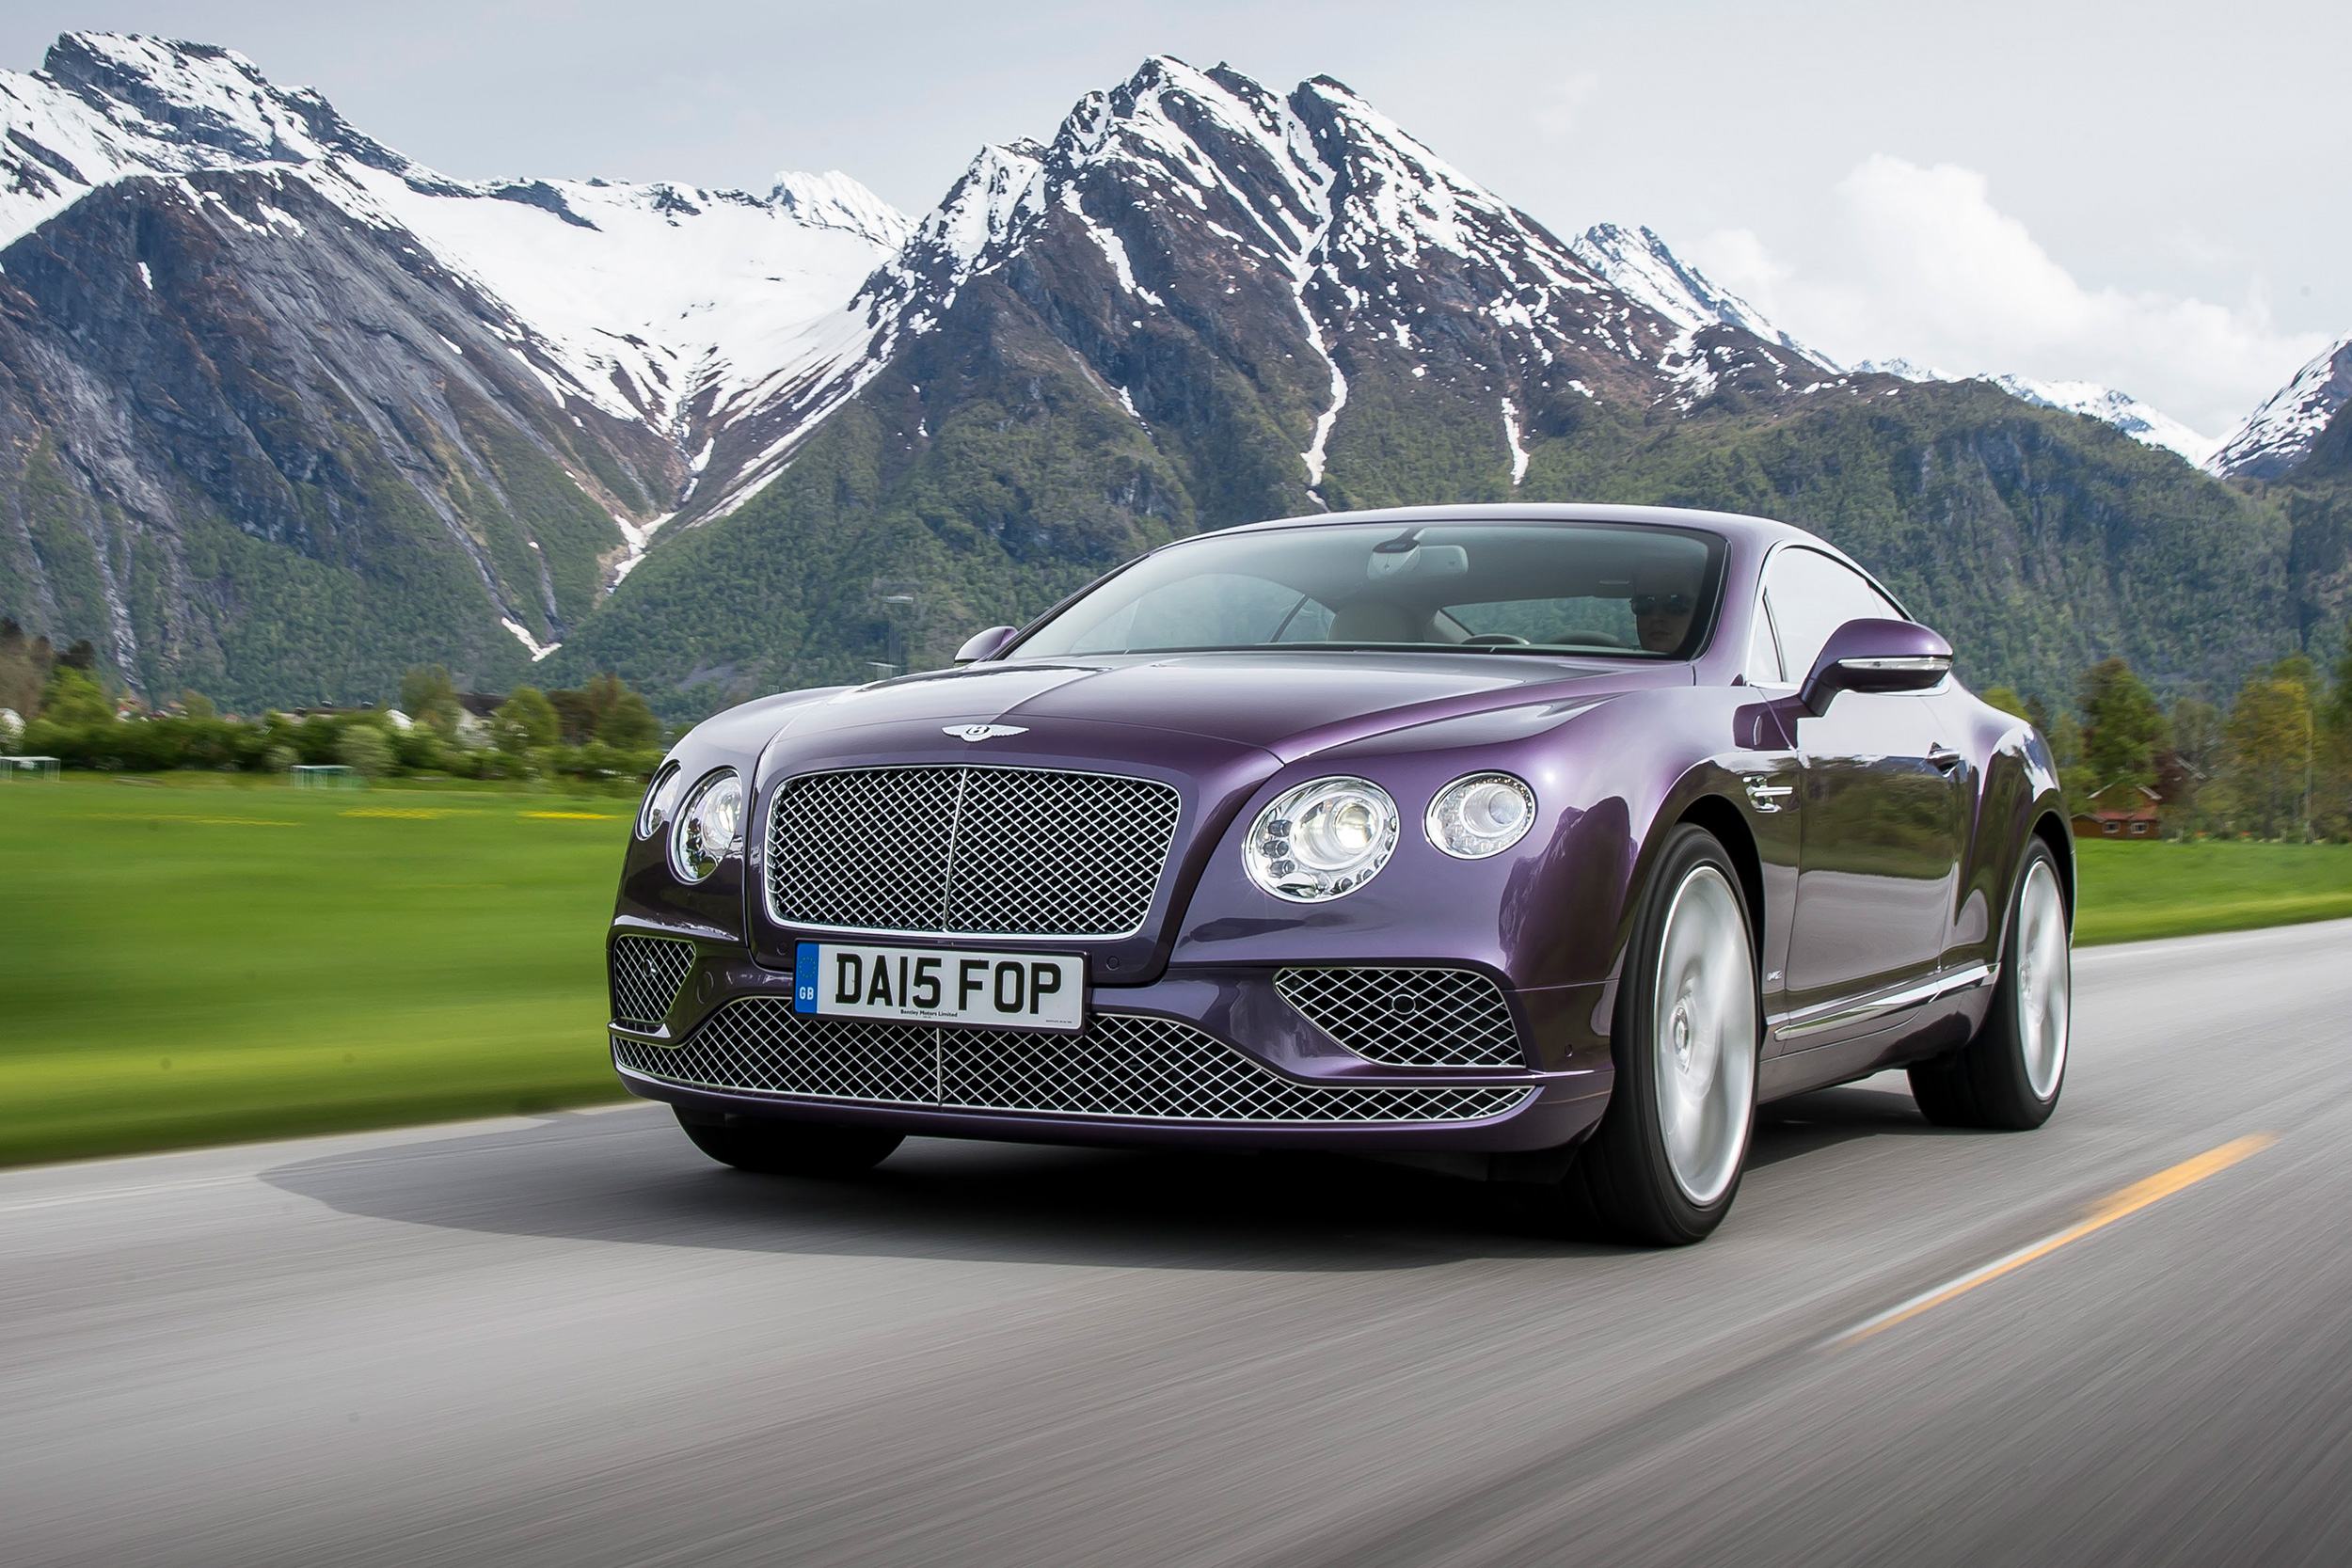 2018 Bentley Continental GT Pricing